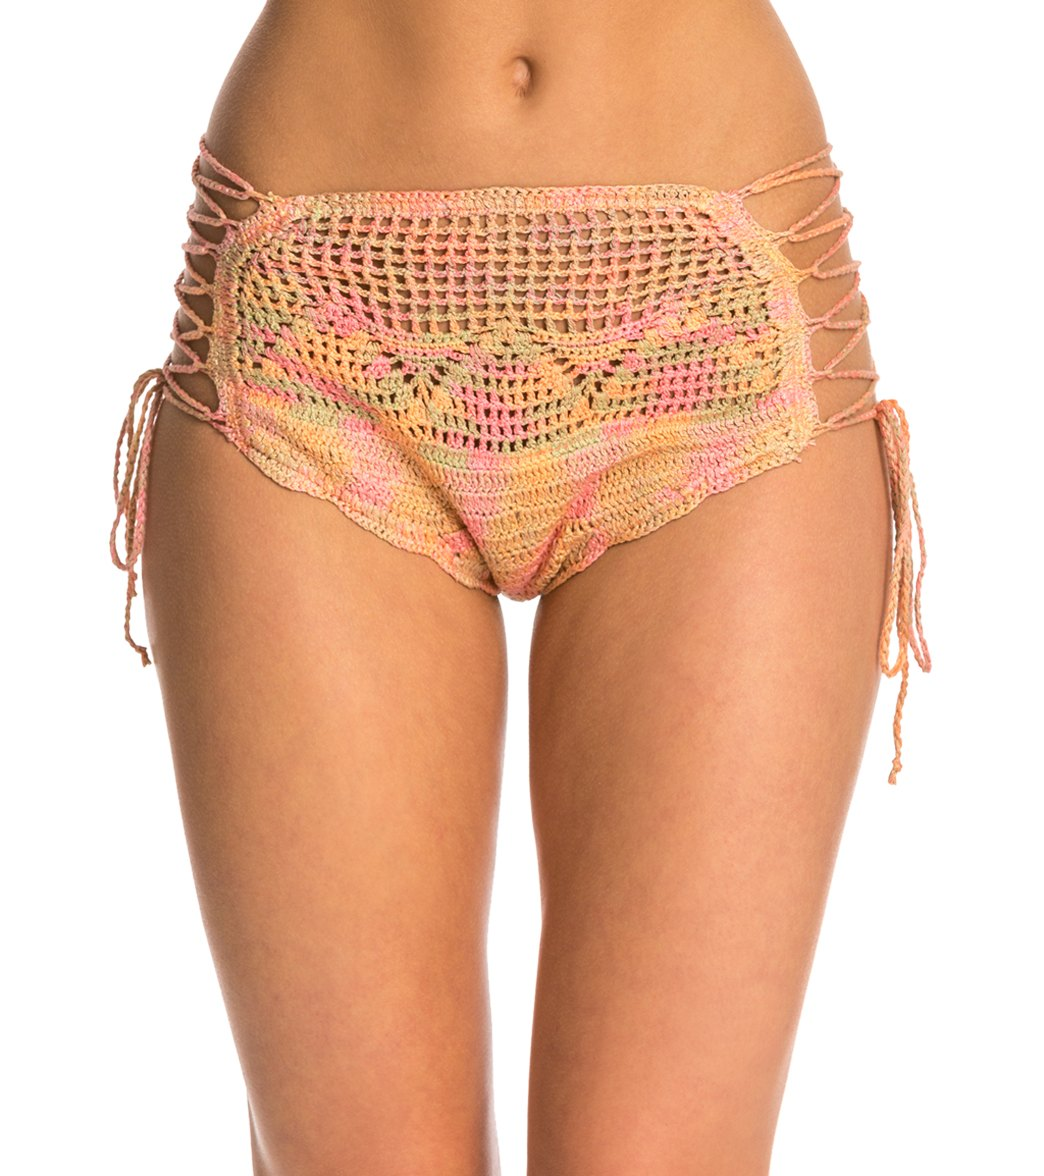 3d8e152164 ONeill Swimwear Anna Sui Love Birds Crochet High Waist Bikini ...